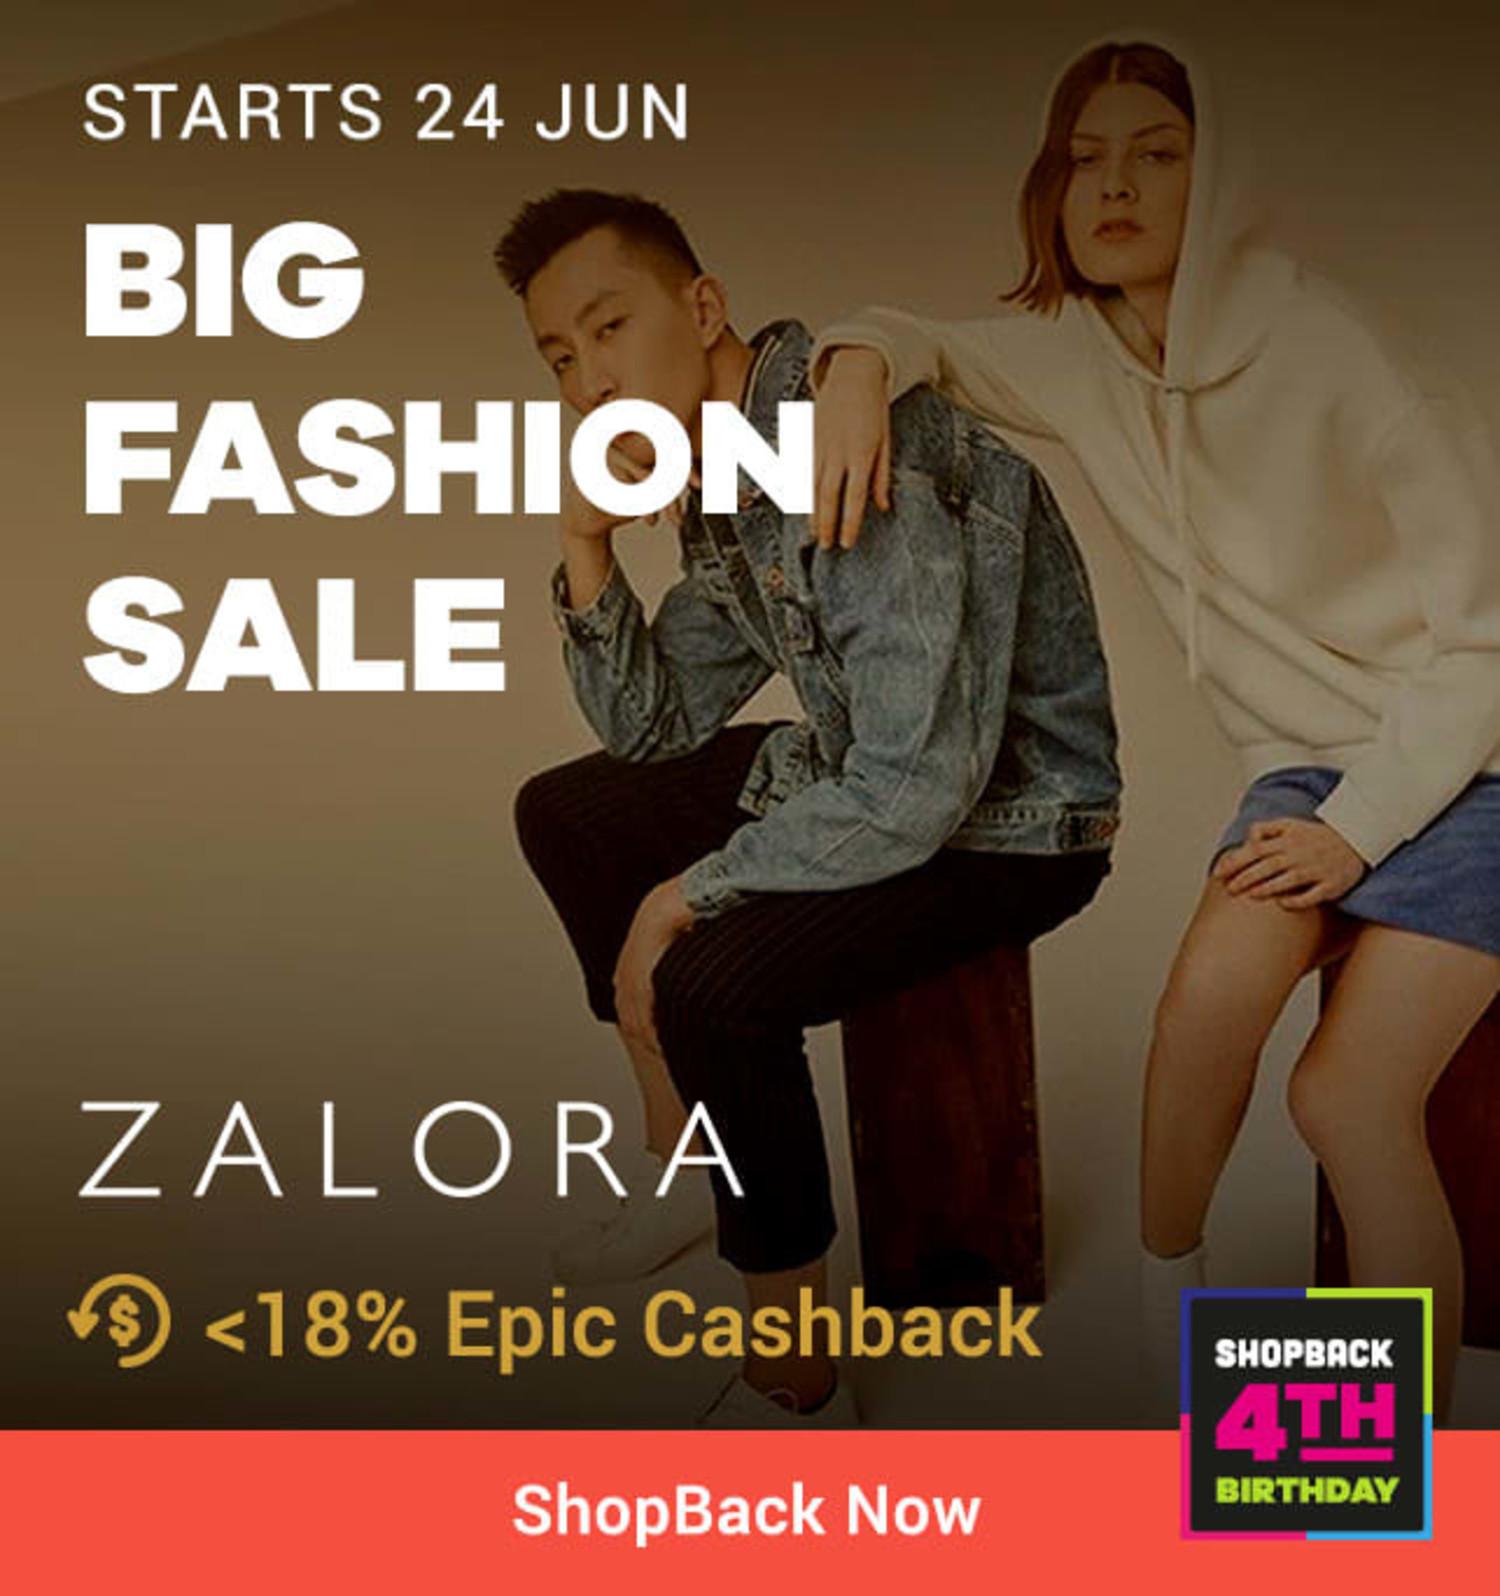 blurb: Starts 24 Jun  ZALORA Big Fashion Sale <18% Mega Cashback (was 3%)